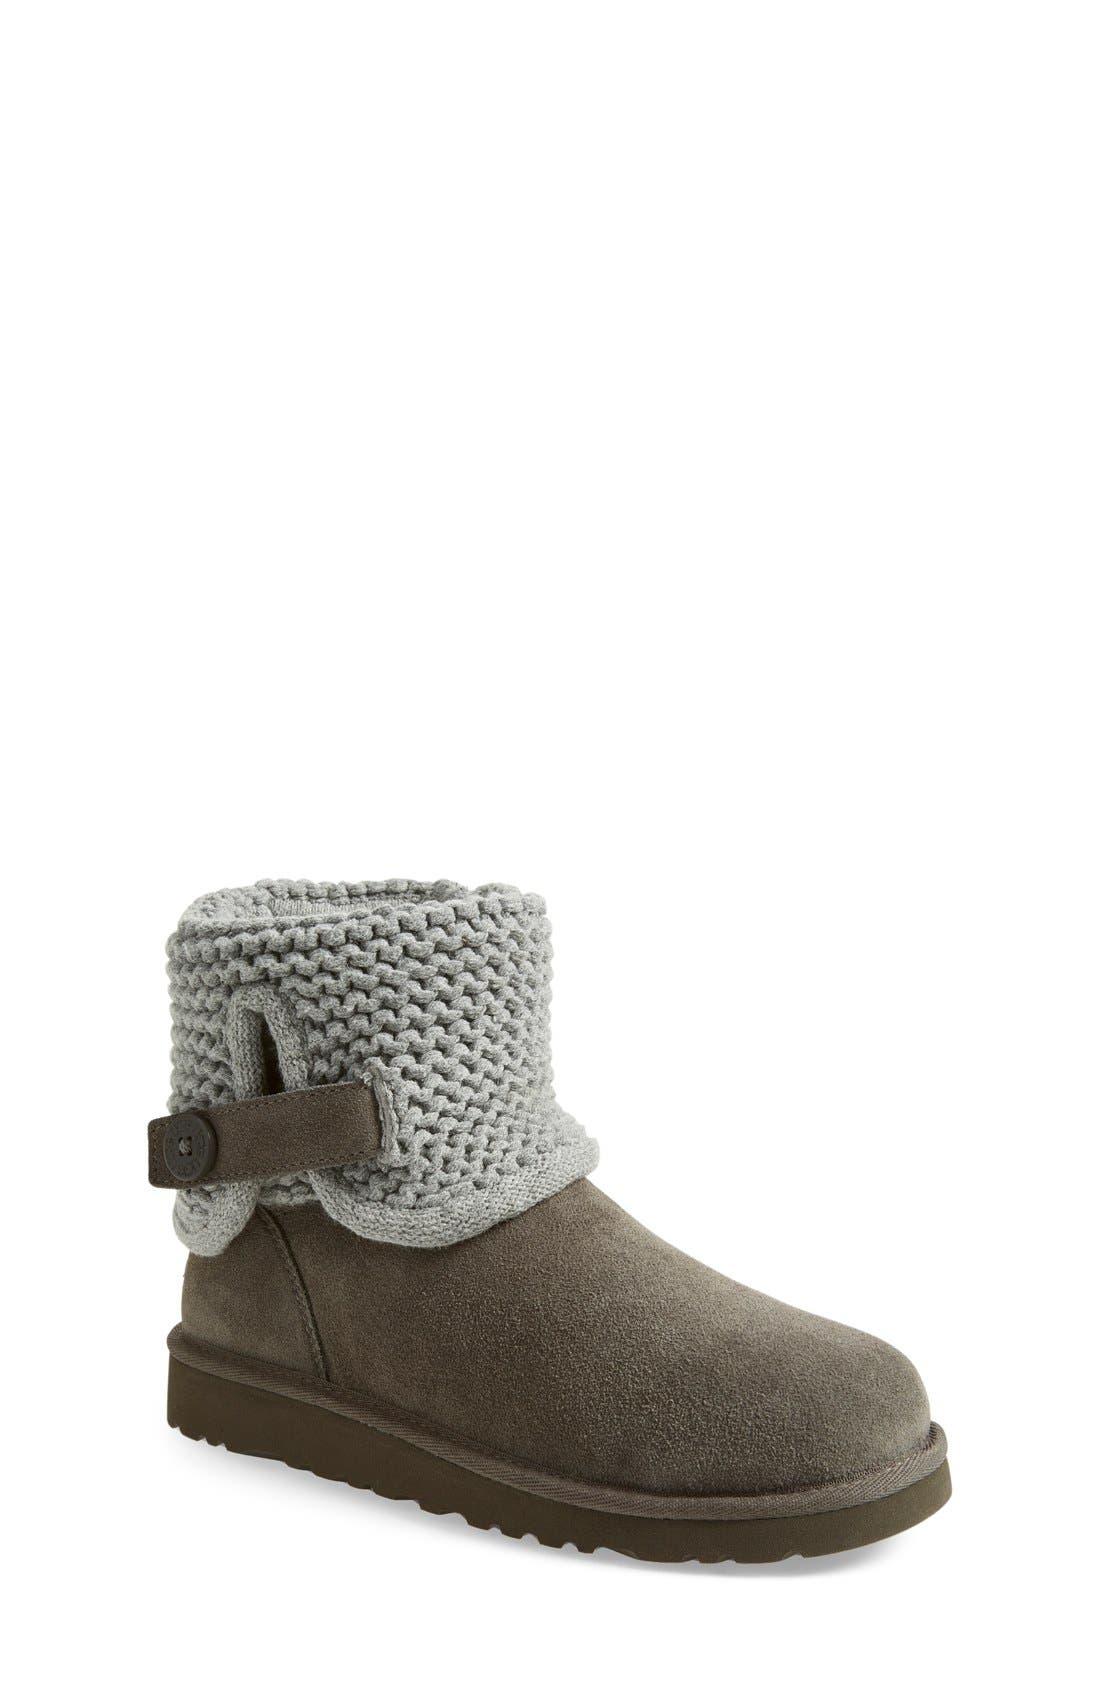 Main Image - UGG® Darrah Purl Knit Cuff Boot (Little Kid & Big Kid)